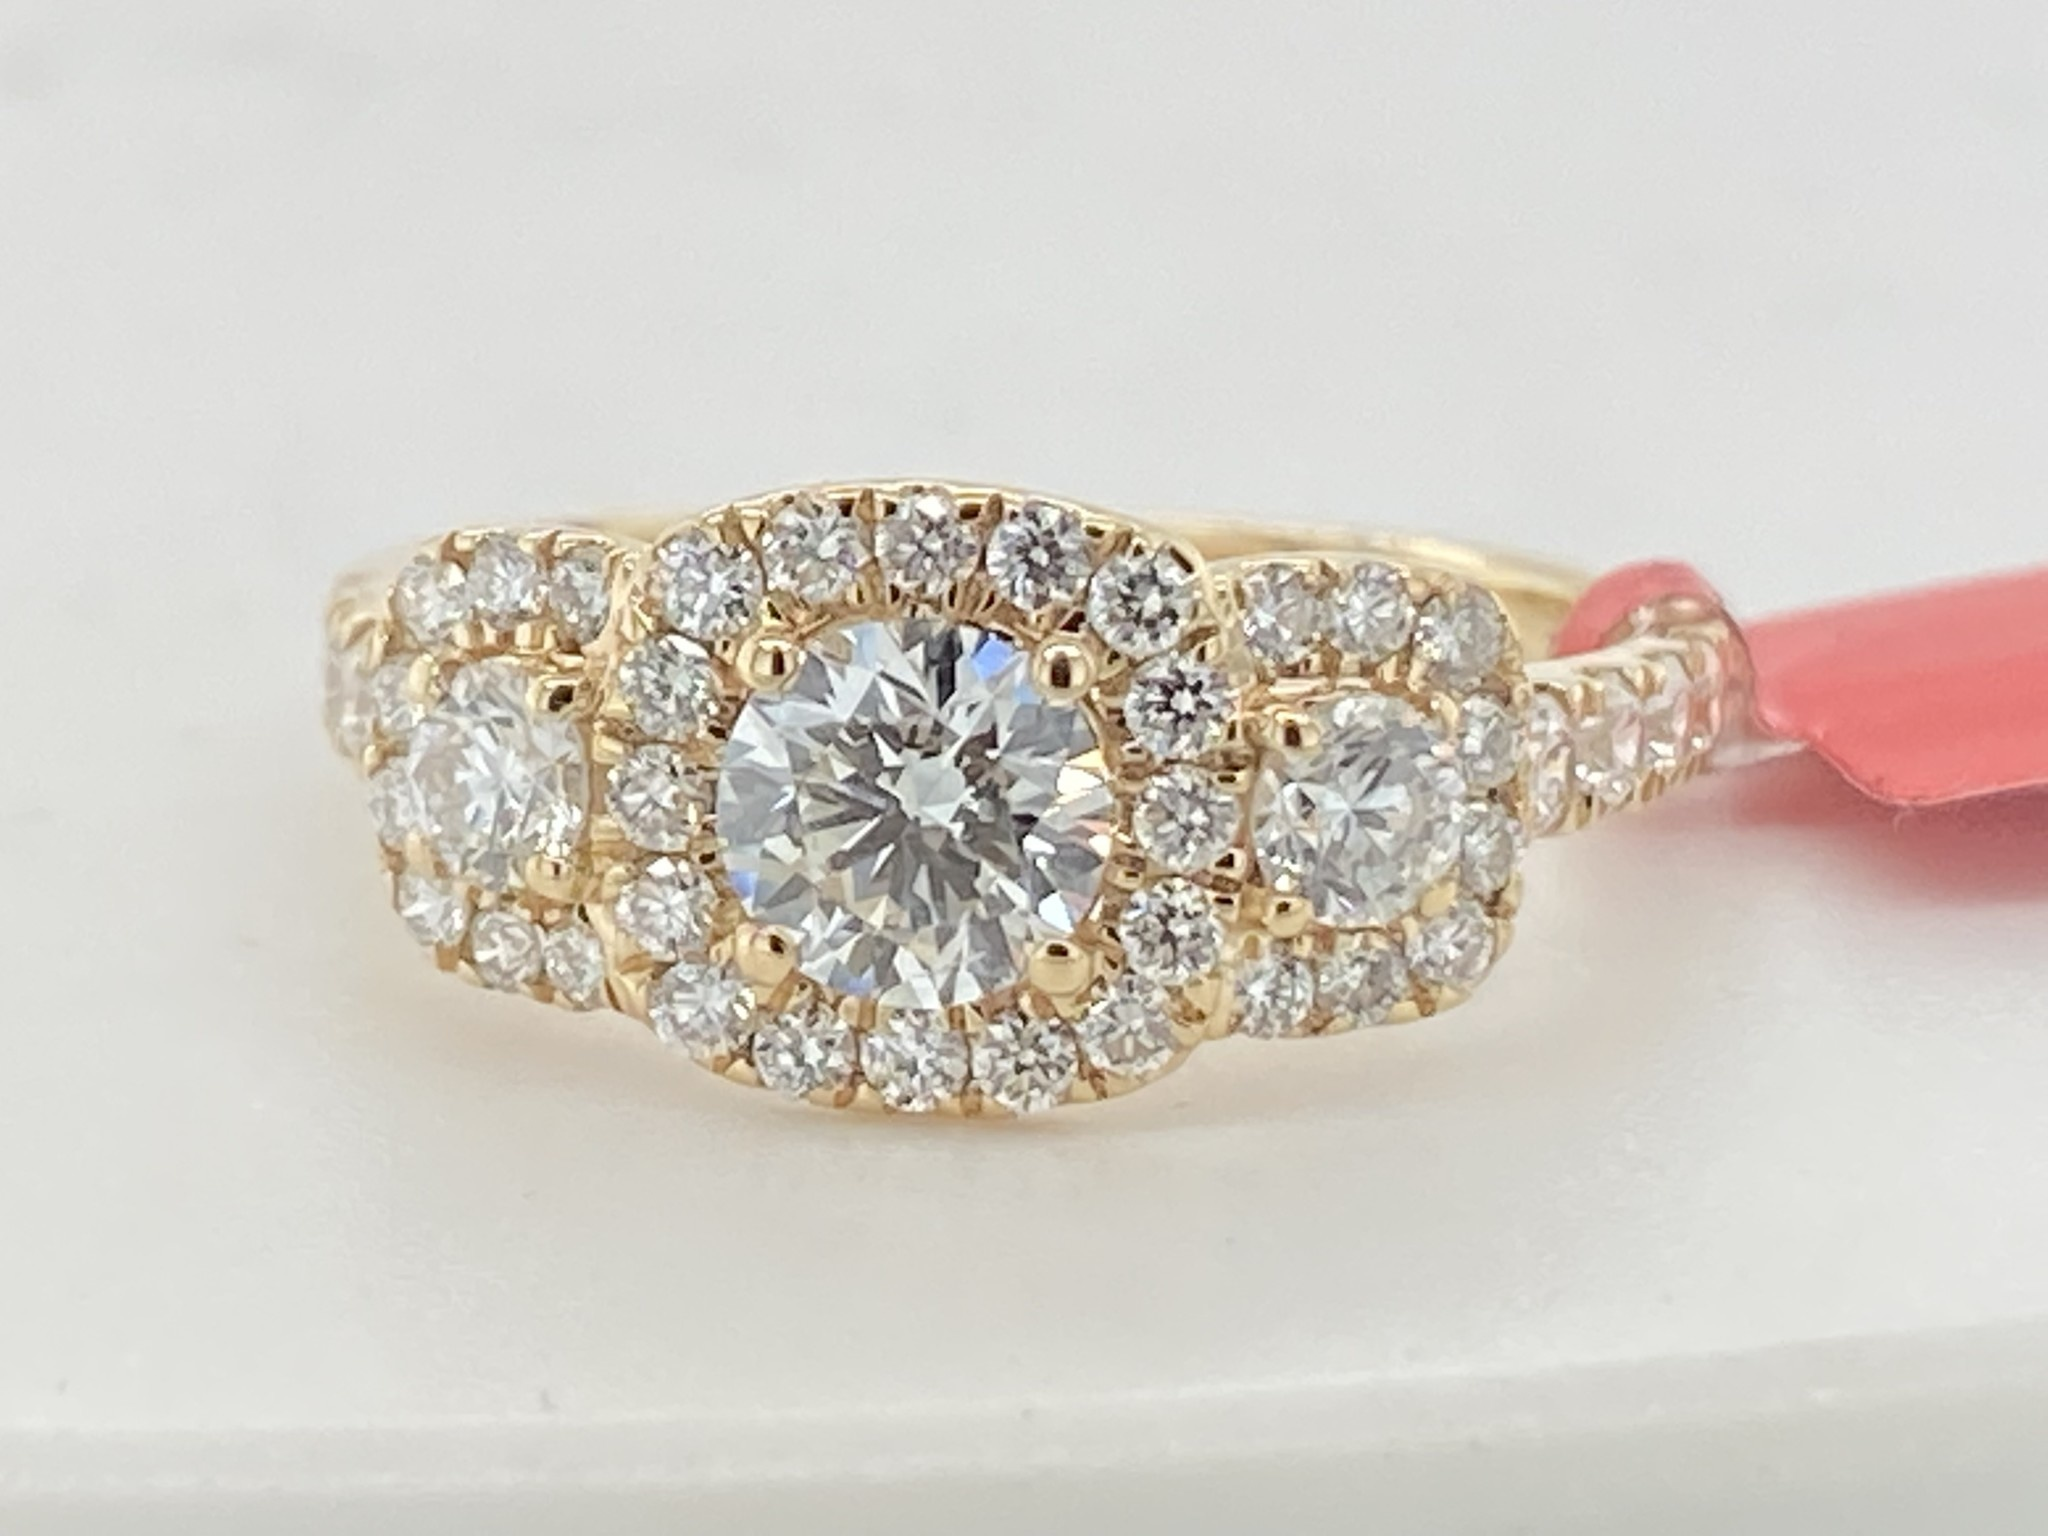 14KY 1.25TW LG Diamond Engagement Ring